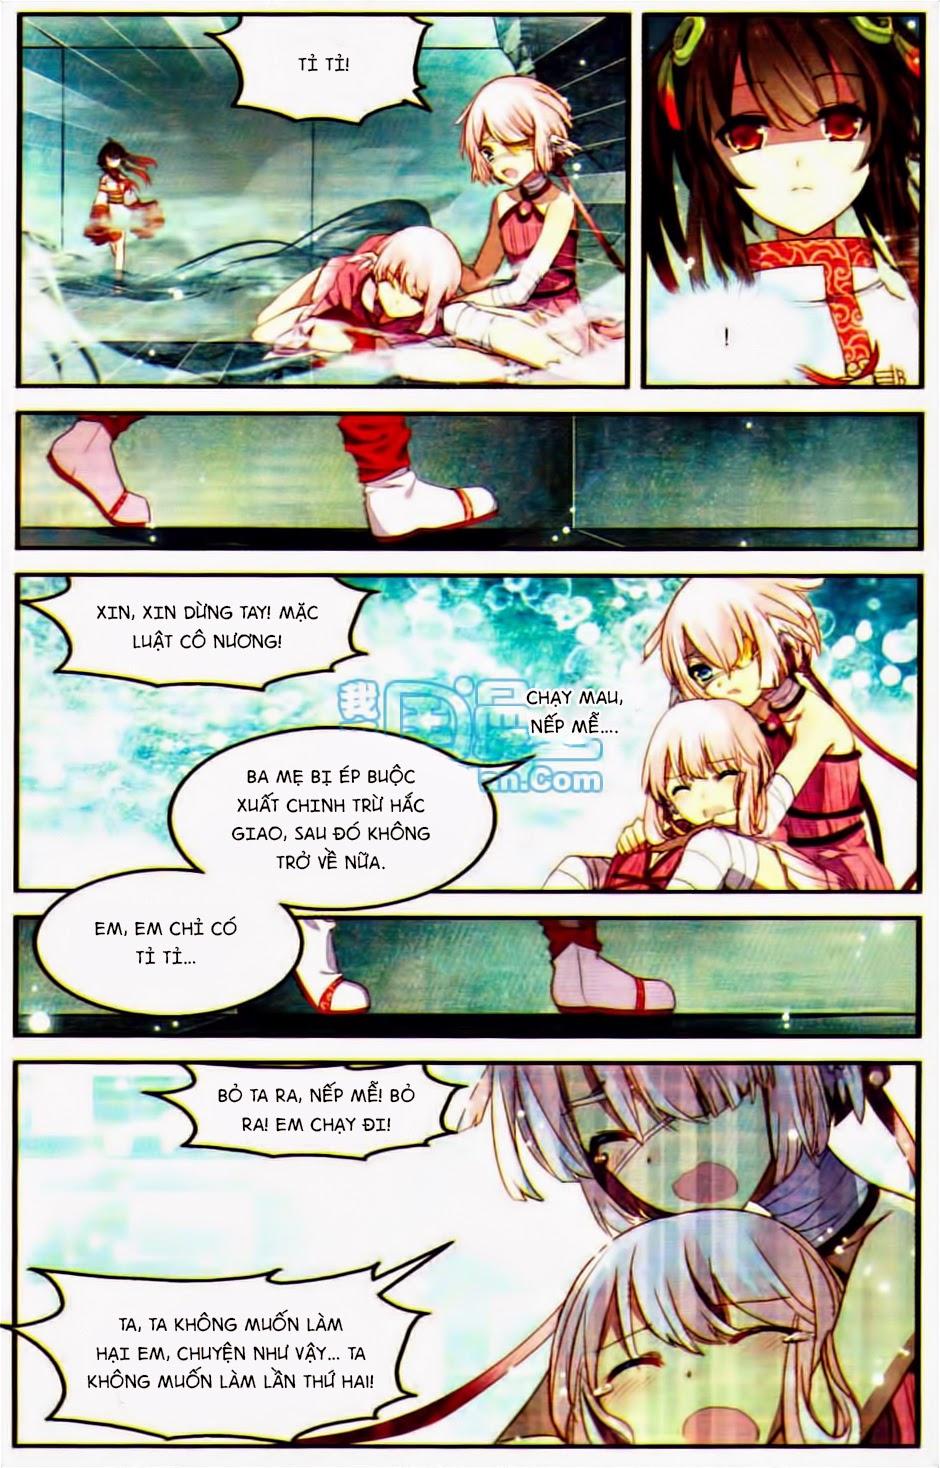 a3manga.com thien hanh thiet su chap 22